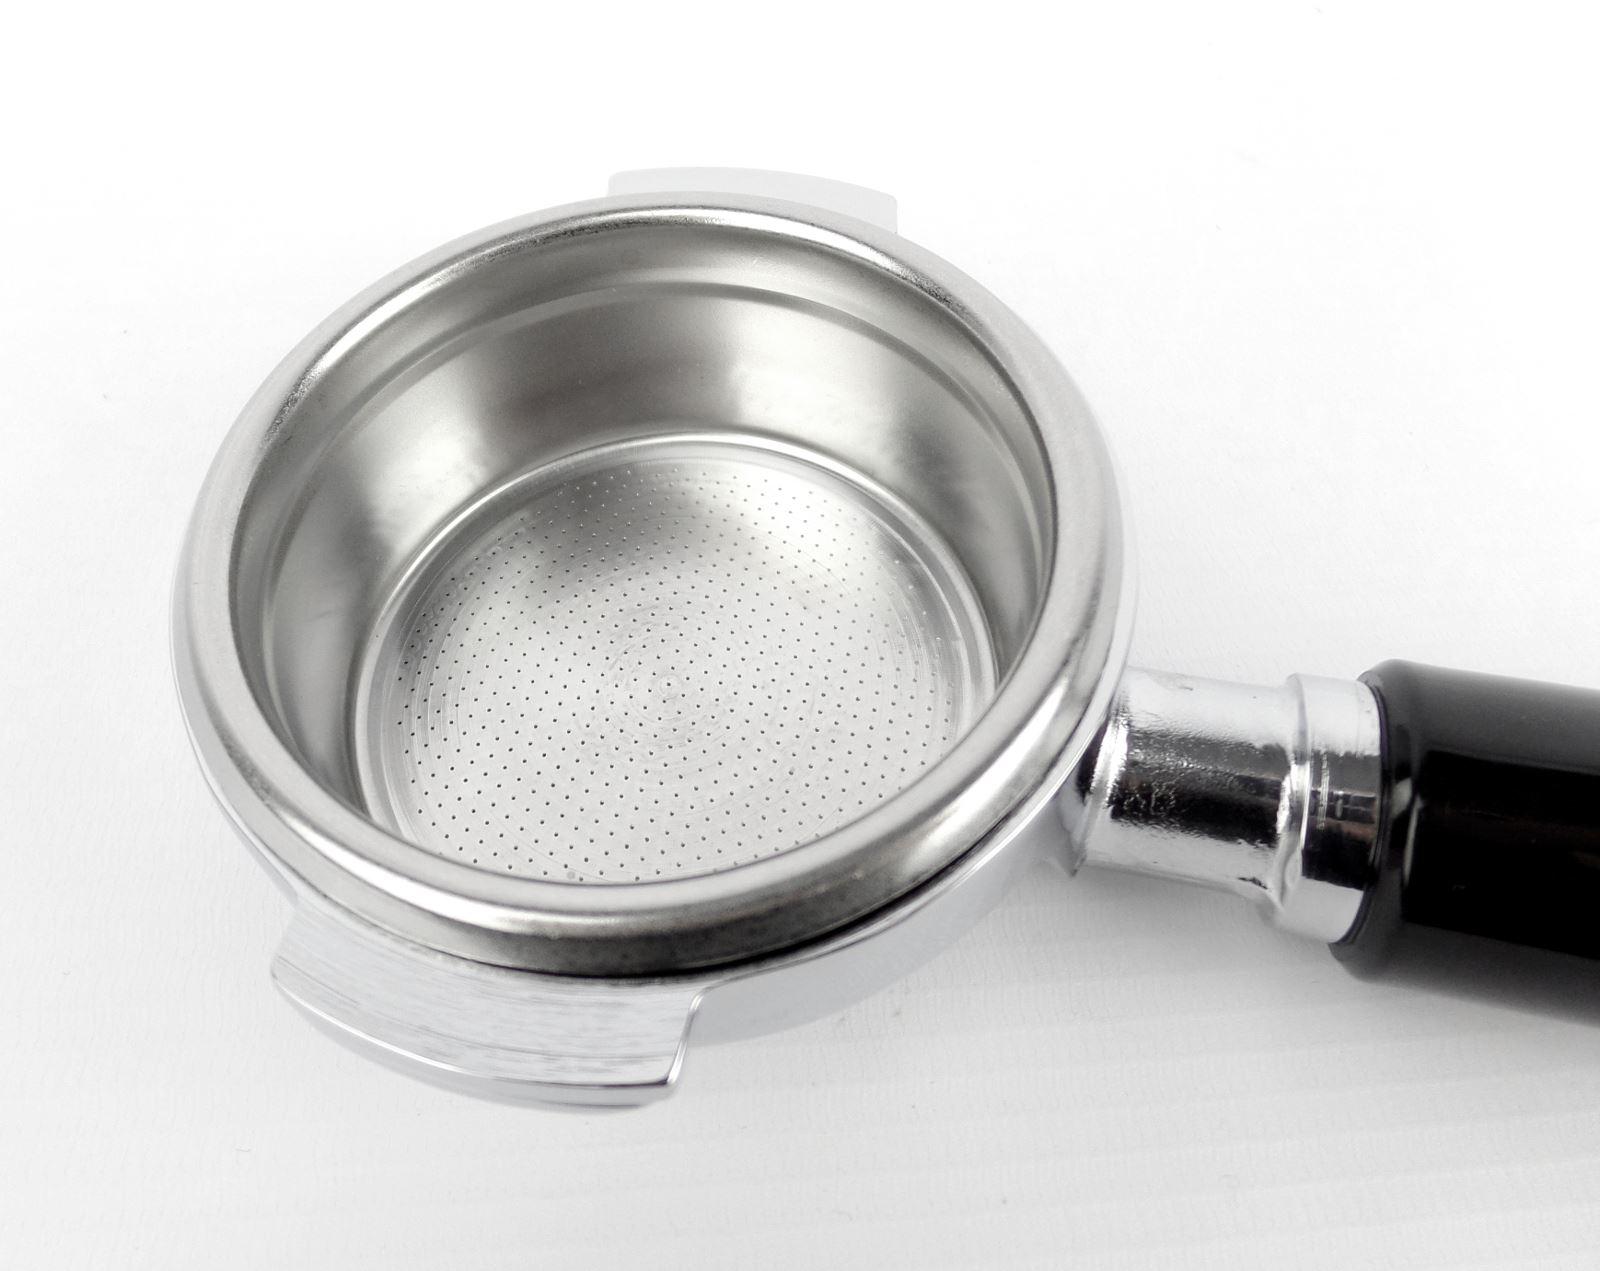 FAEMA Bottomless Naked Portafilter Espresso Handle 21g Triple Basket